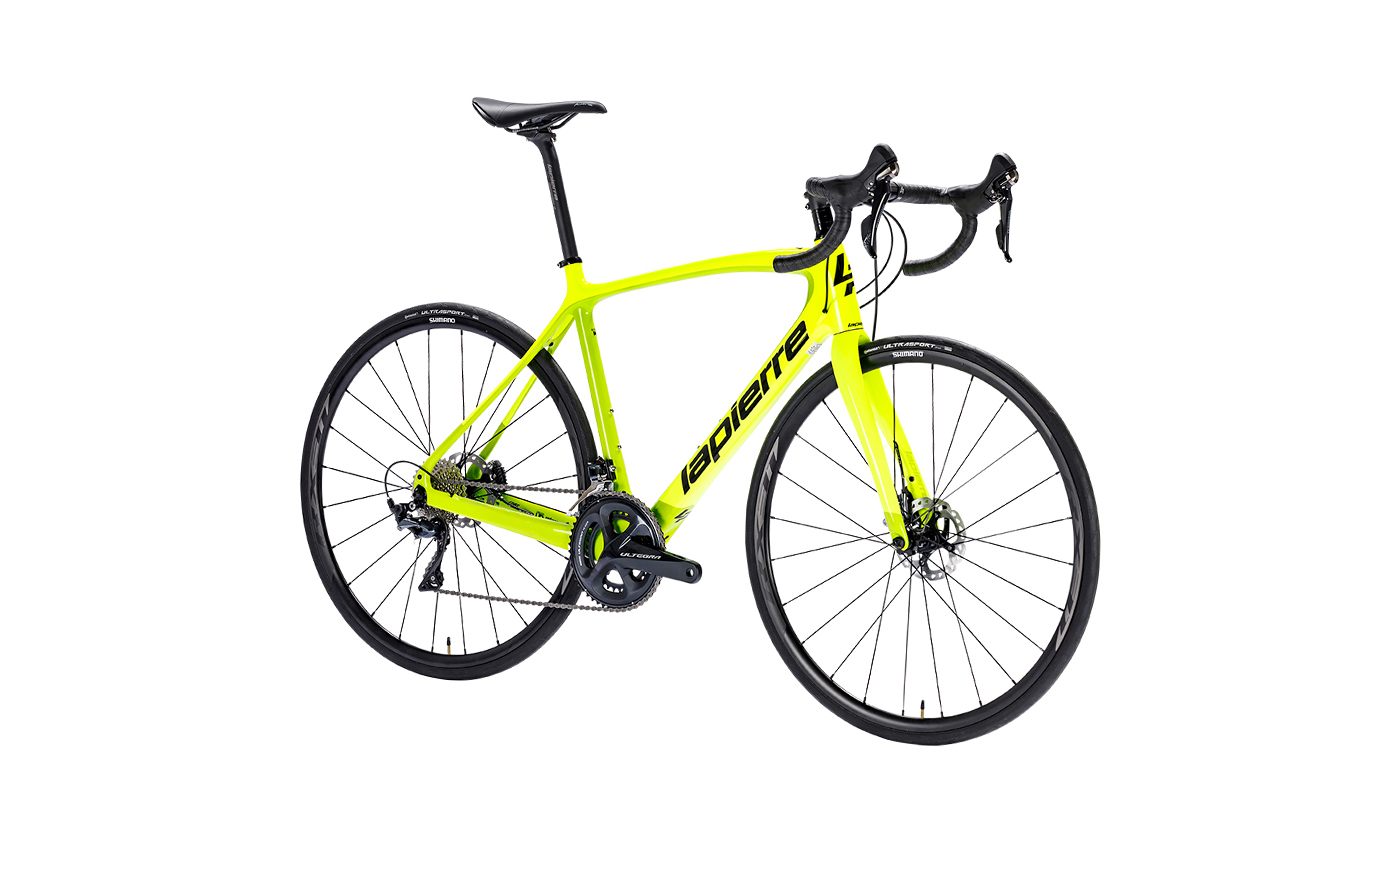 Bicykel LAPIERRE SENSIUM 600 DISC CP 2018